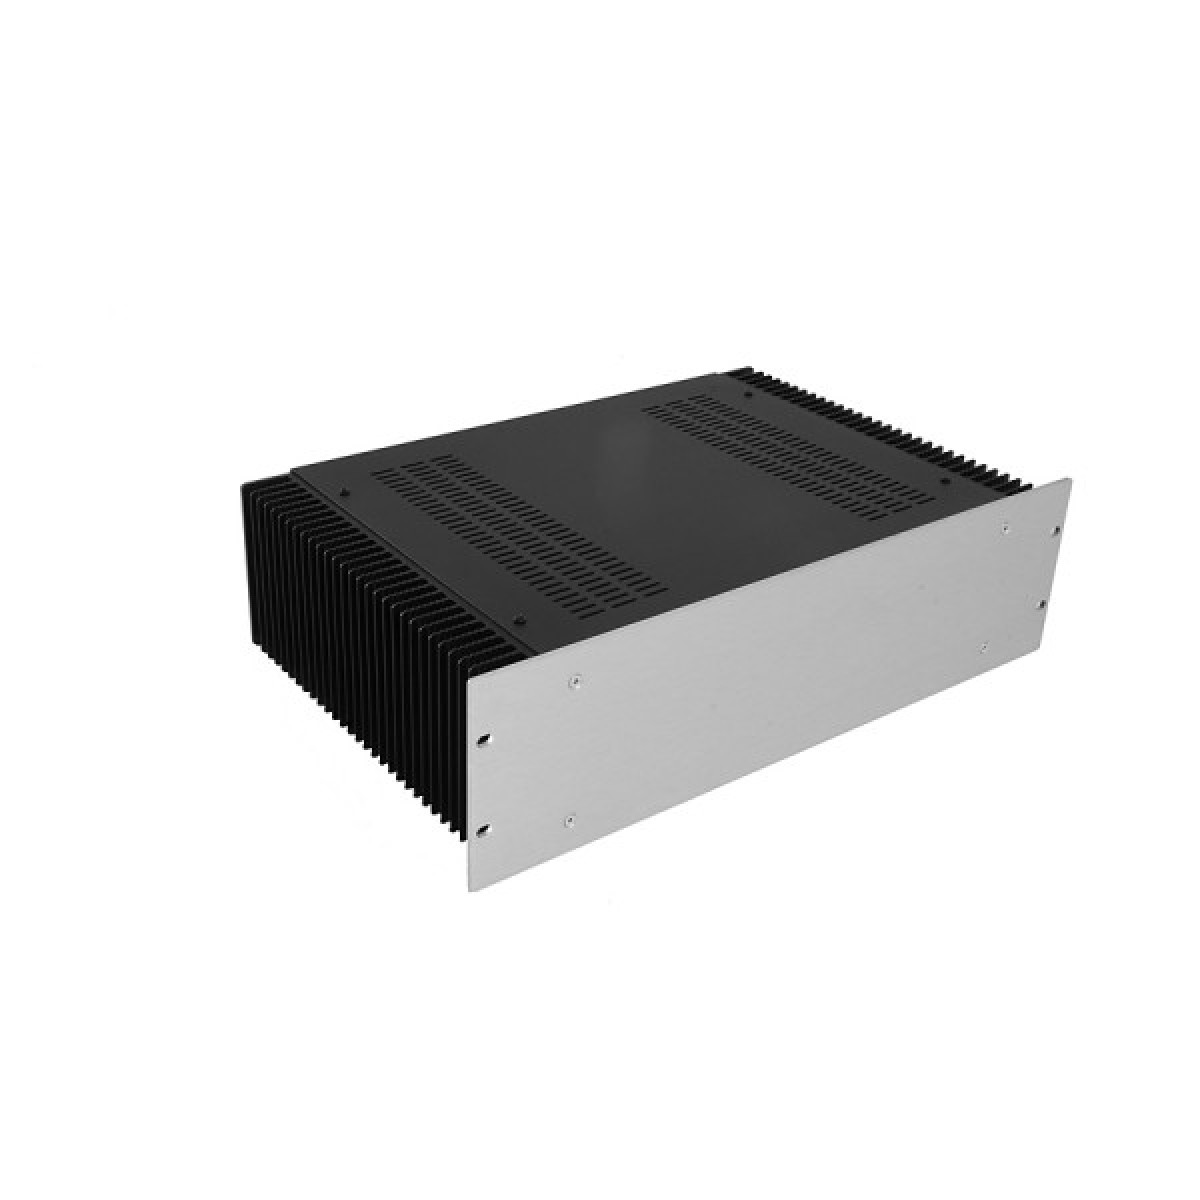 FirstWatt. Cajas y disipadores DSC_8210-600x600-1200x1200